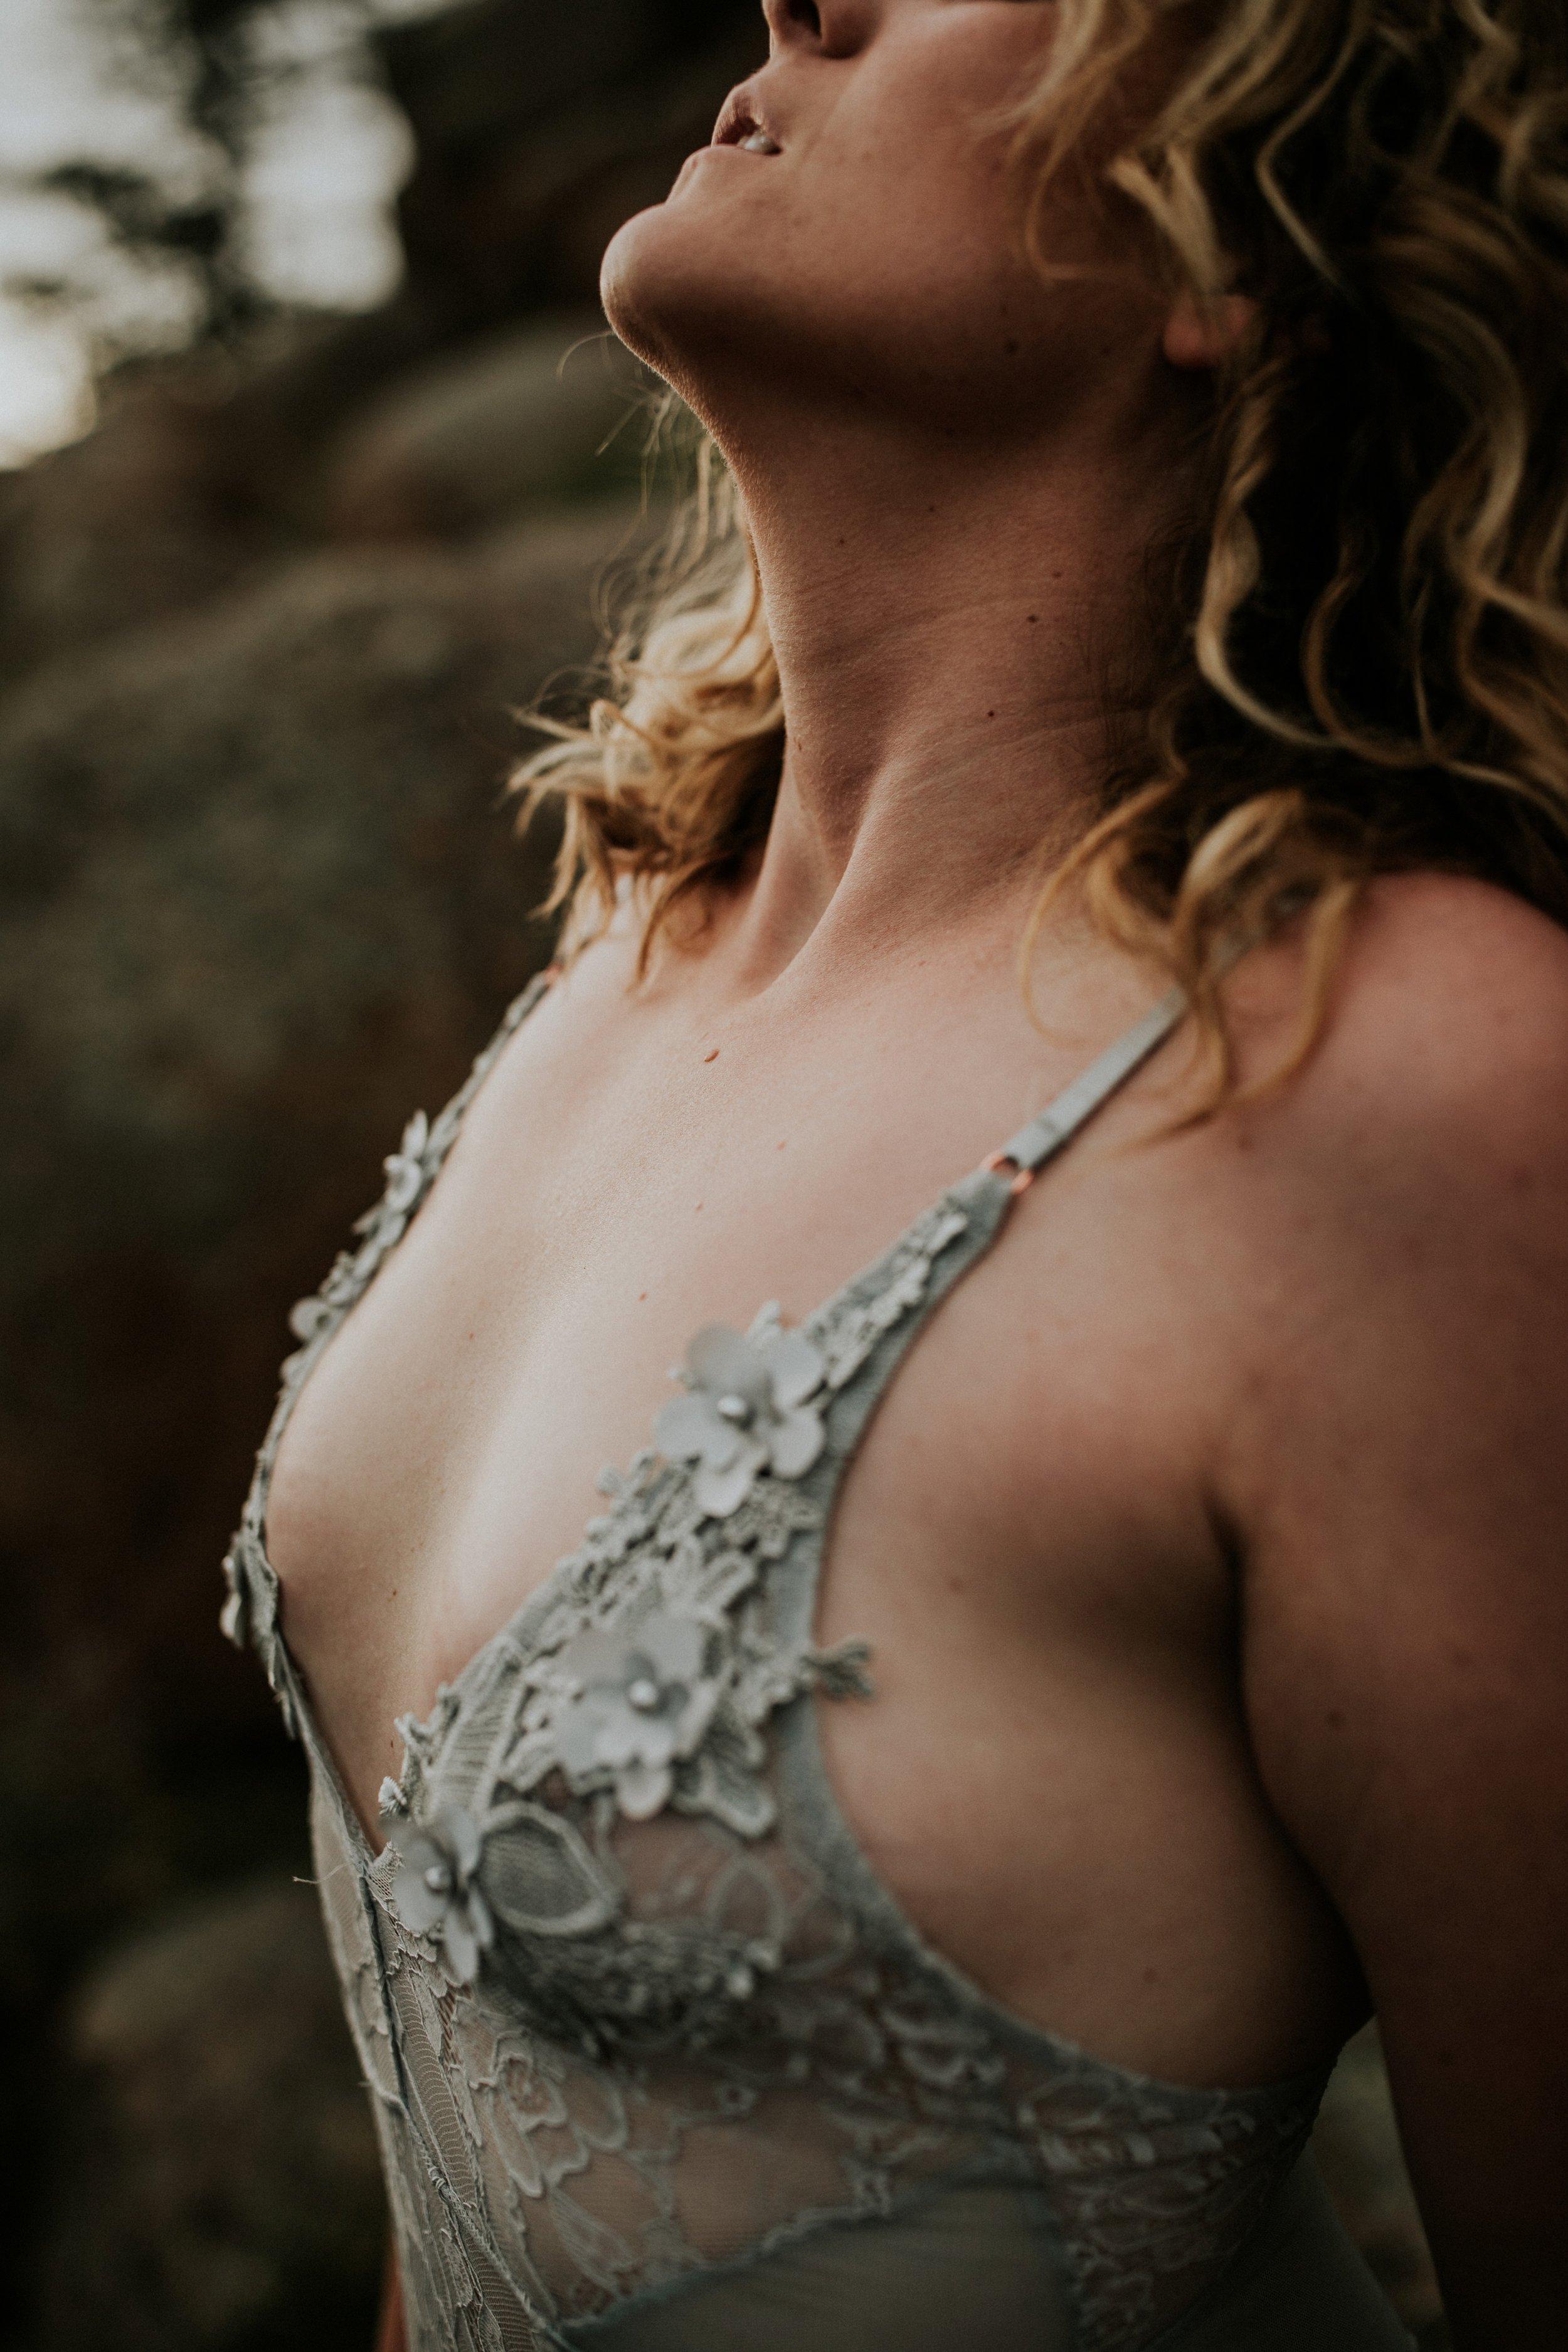 colorado-boudoir-photographer-vedauwoo-soul-session-jessica-max-193.jpg